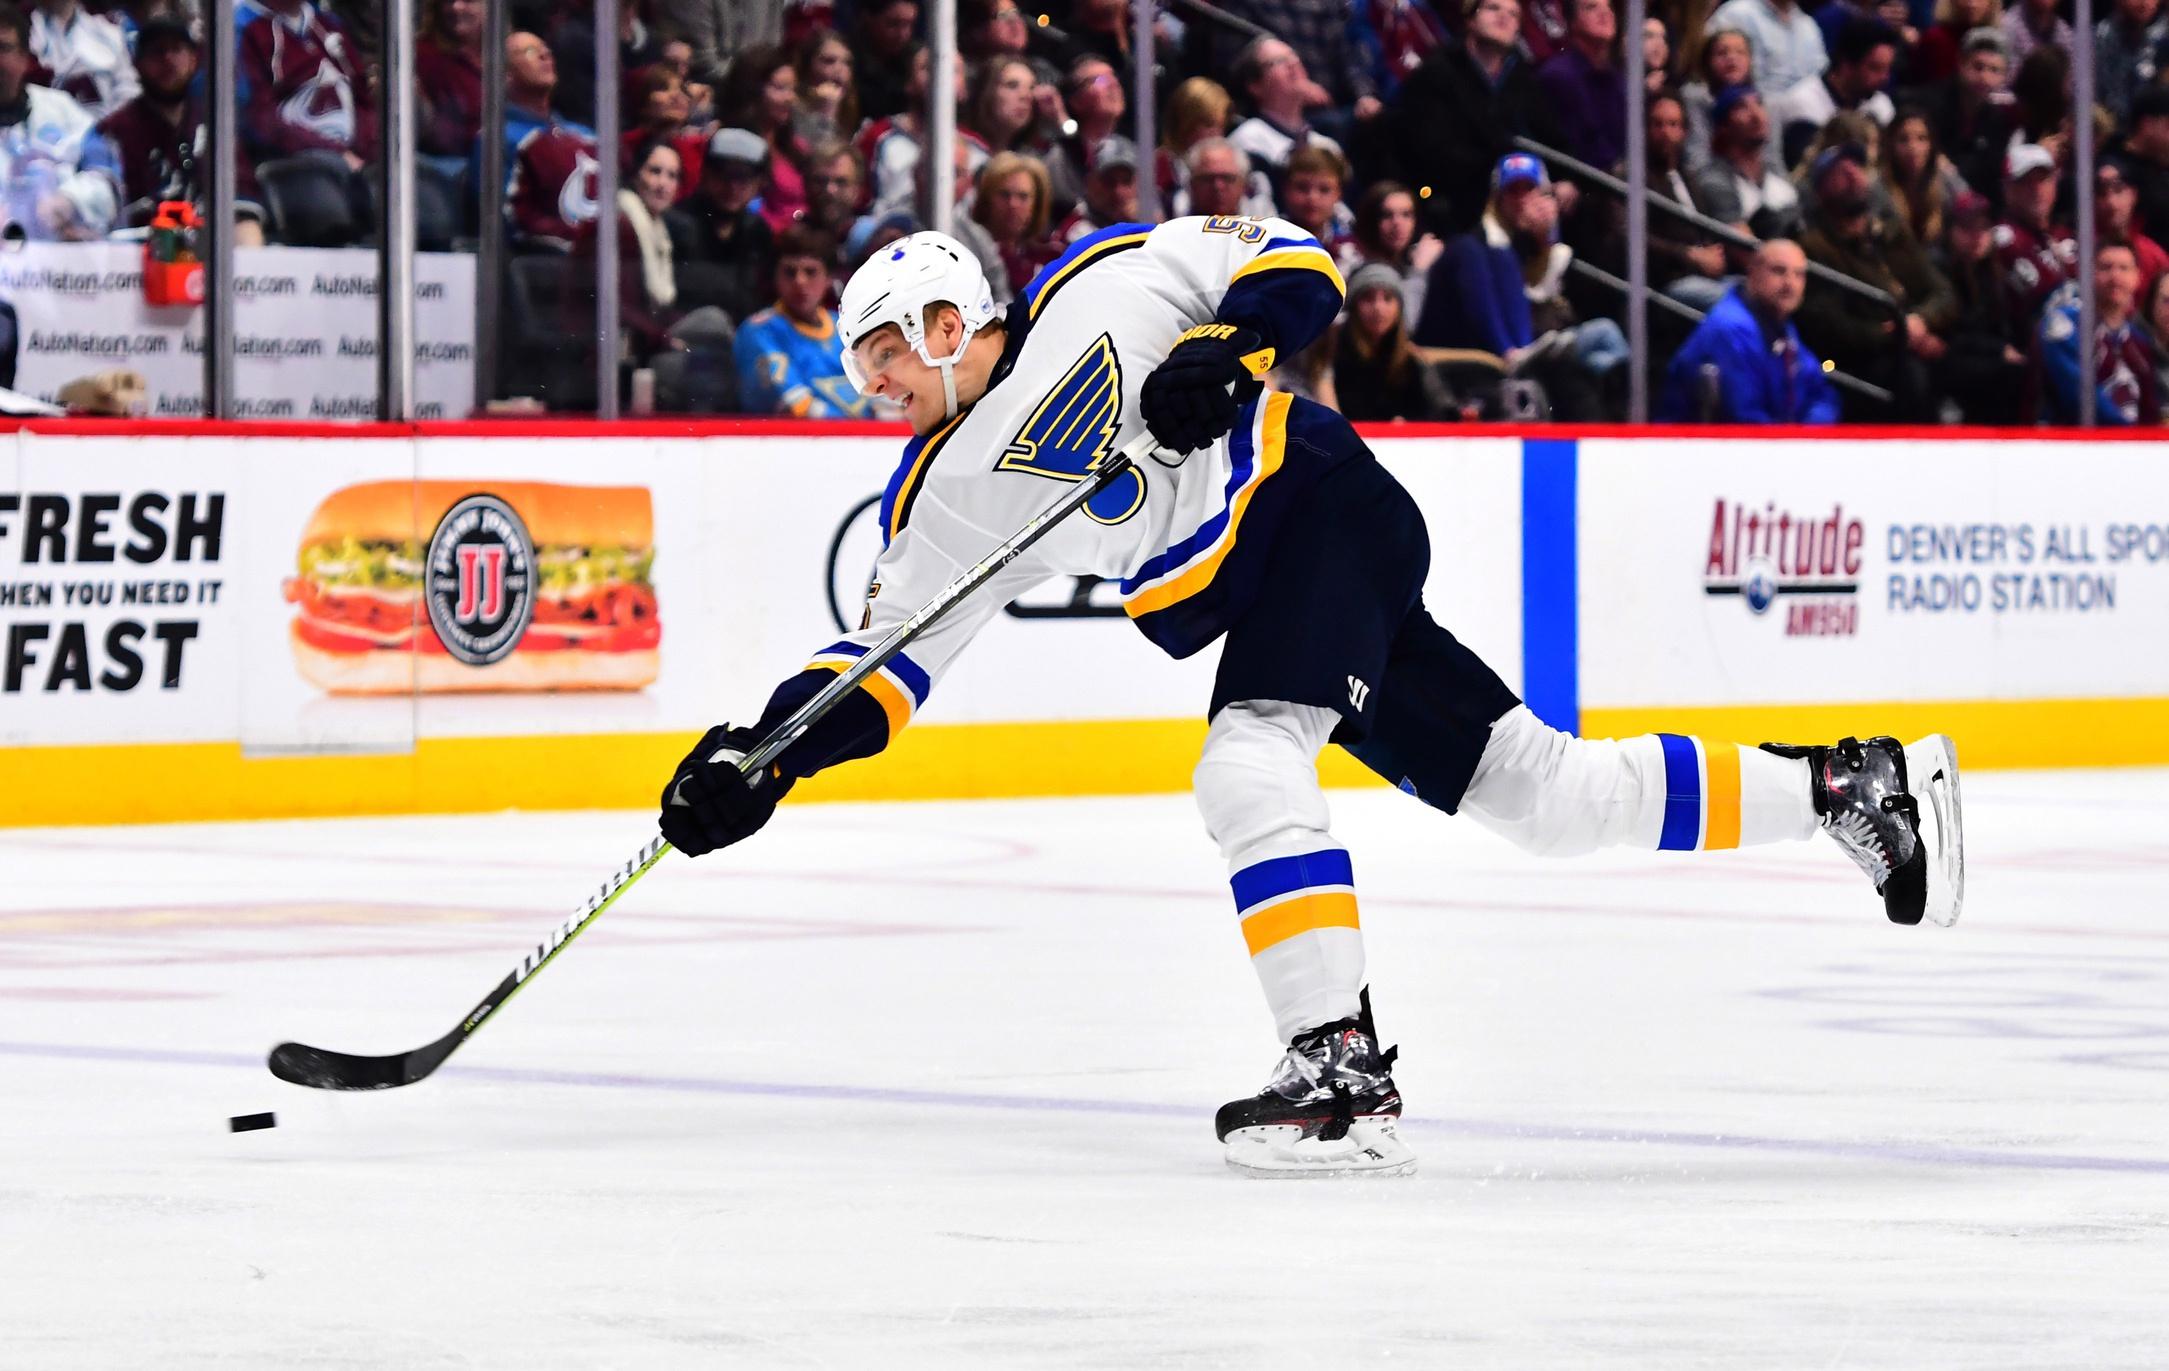 Colton Parayko had the hardest shot at the 2018 IIHF Ice Hockey World Championship